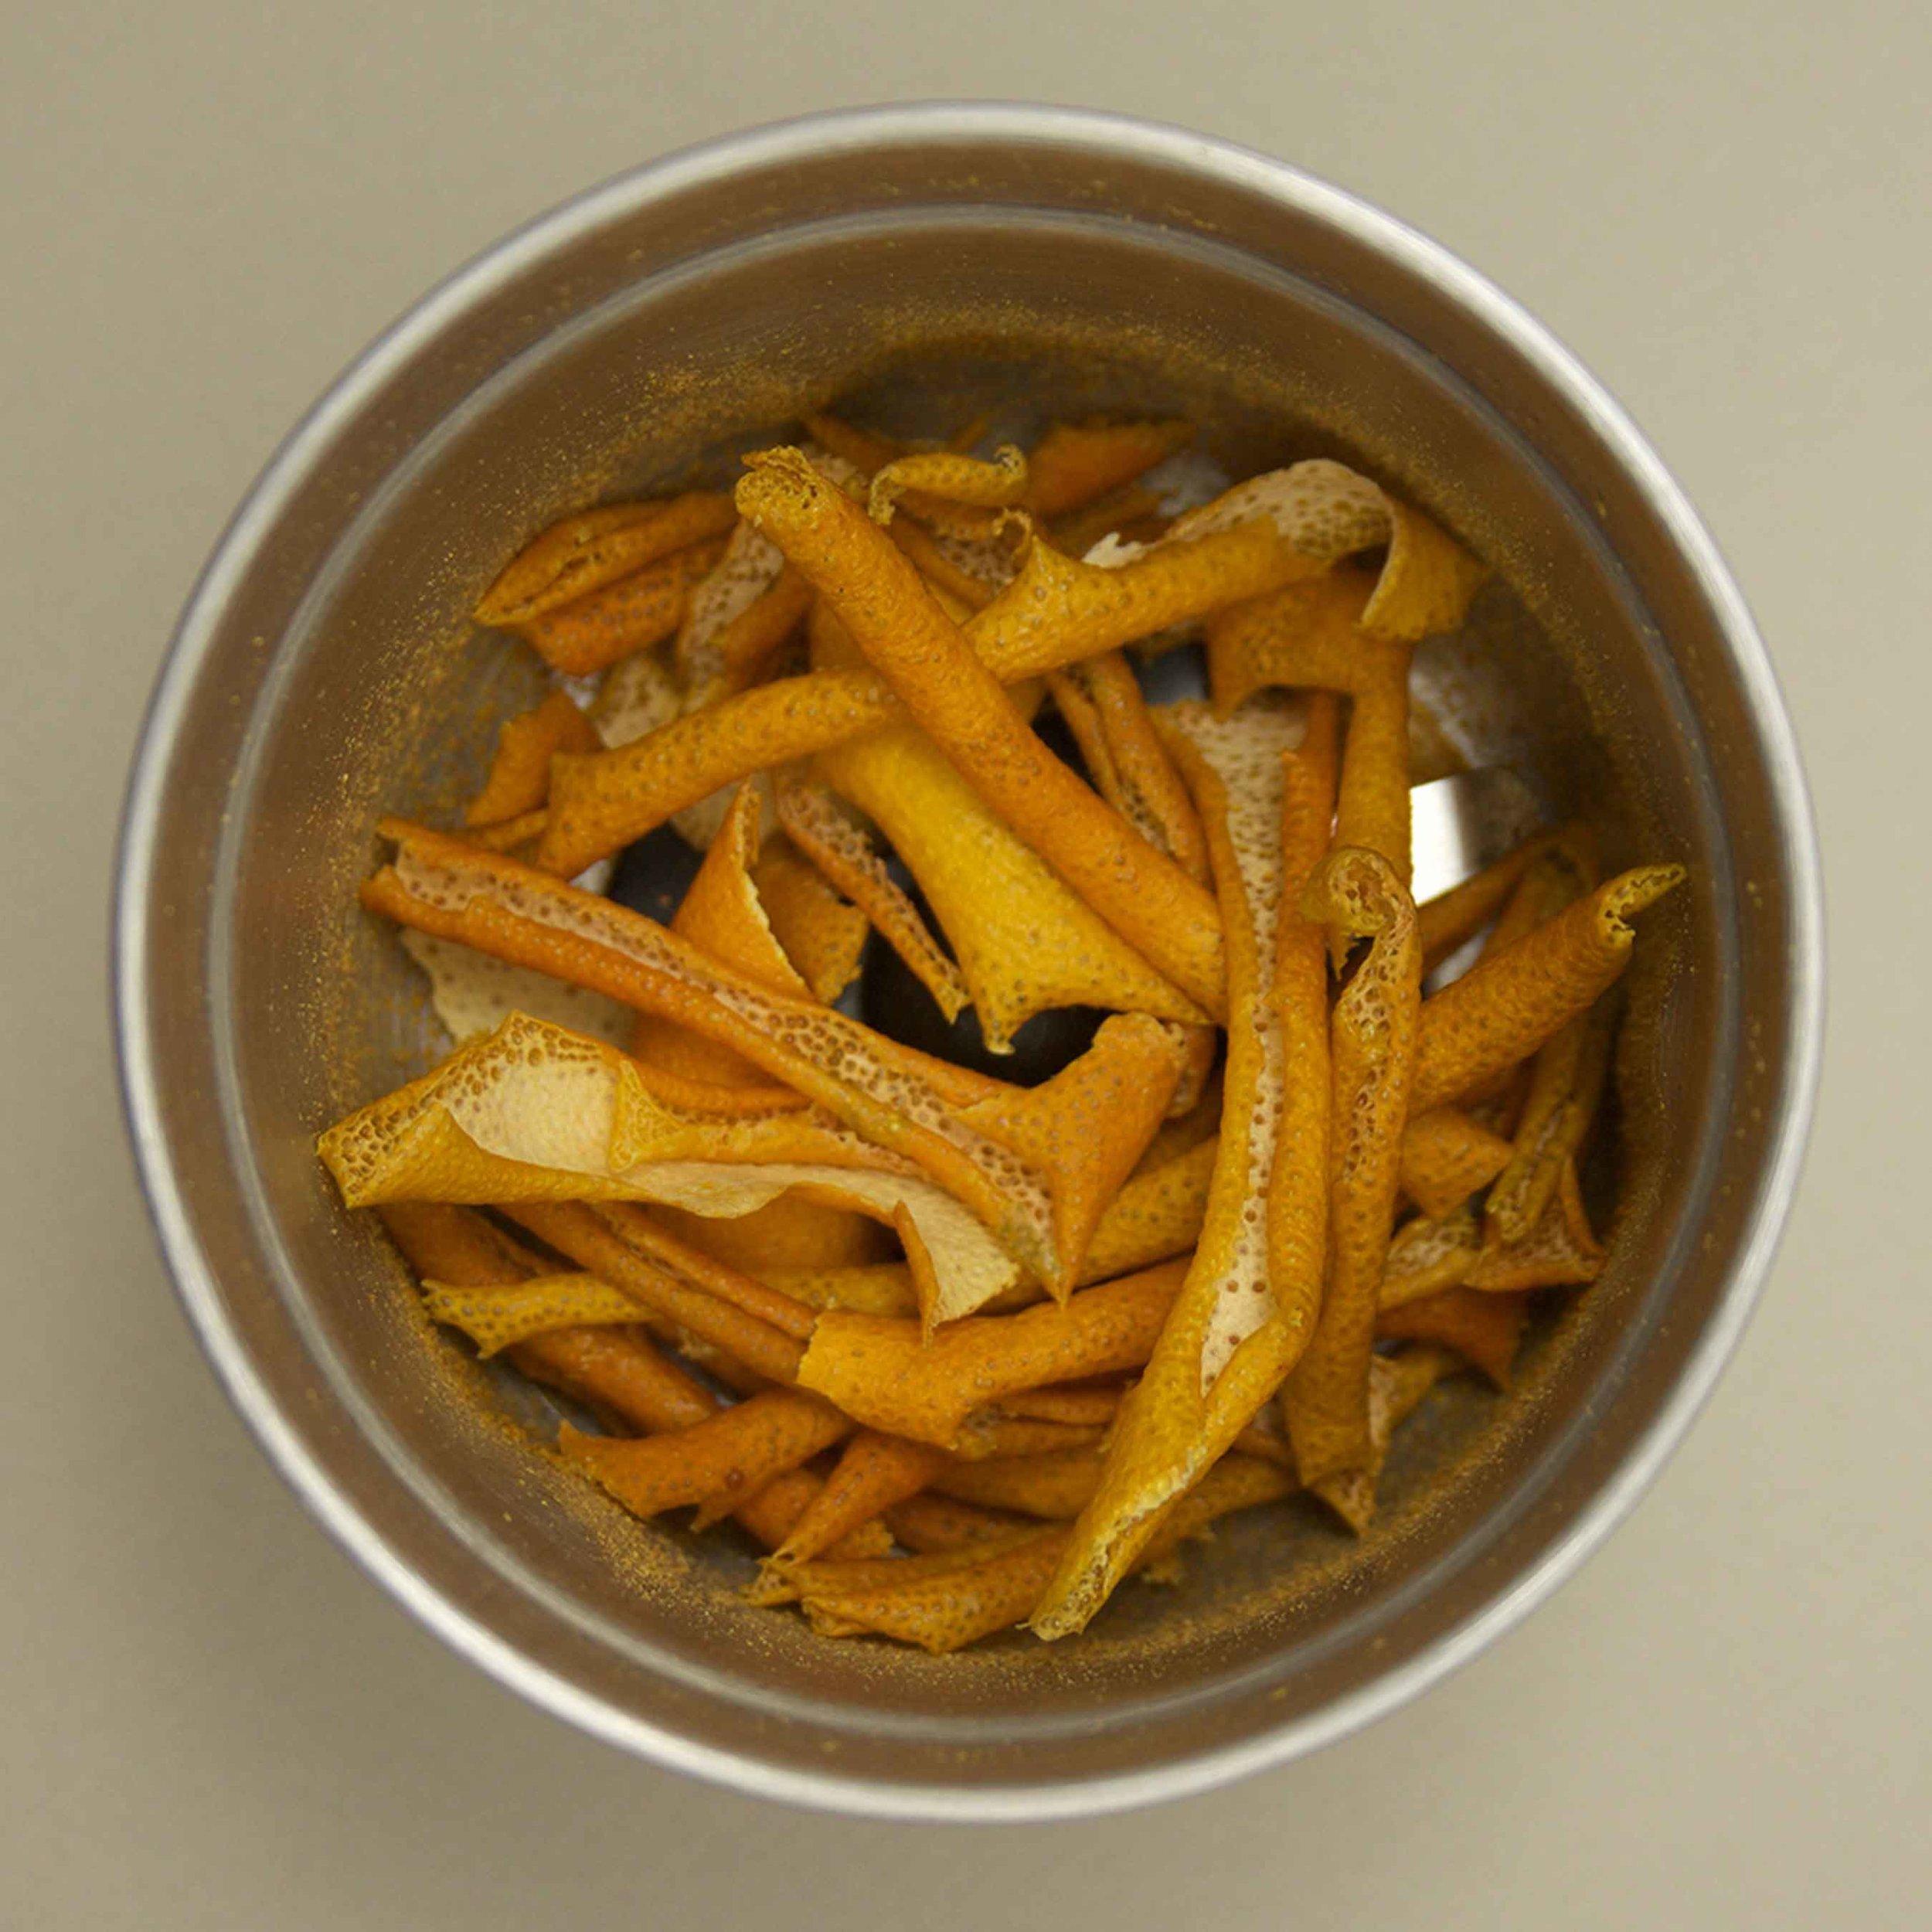 Dried orange peels, wait to be ground